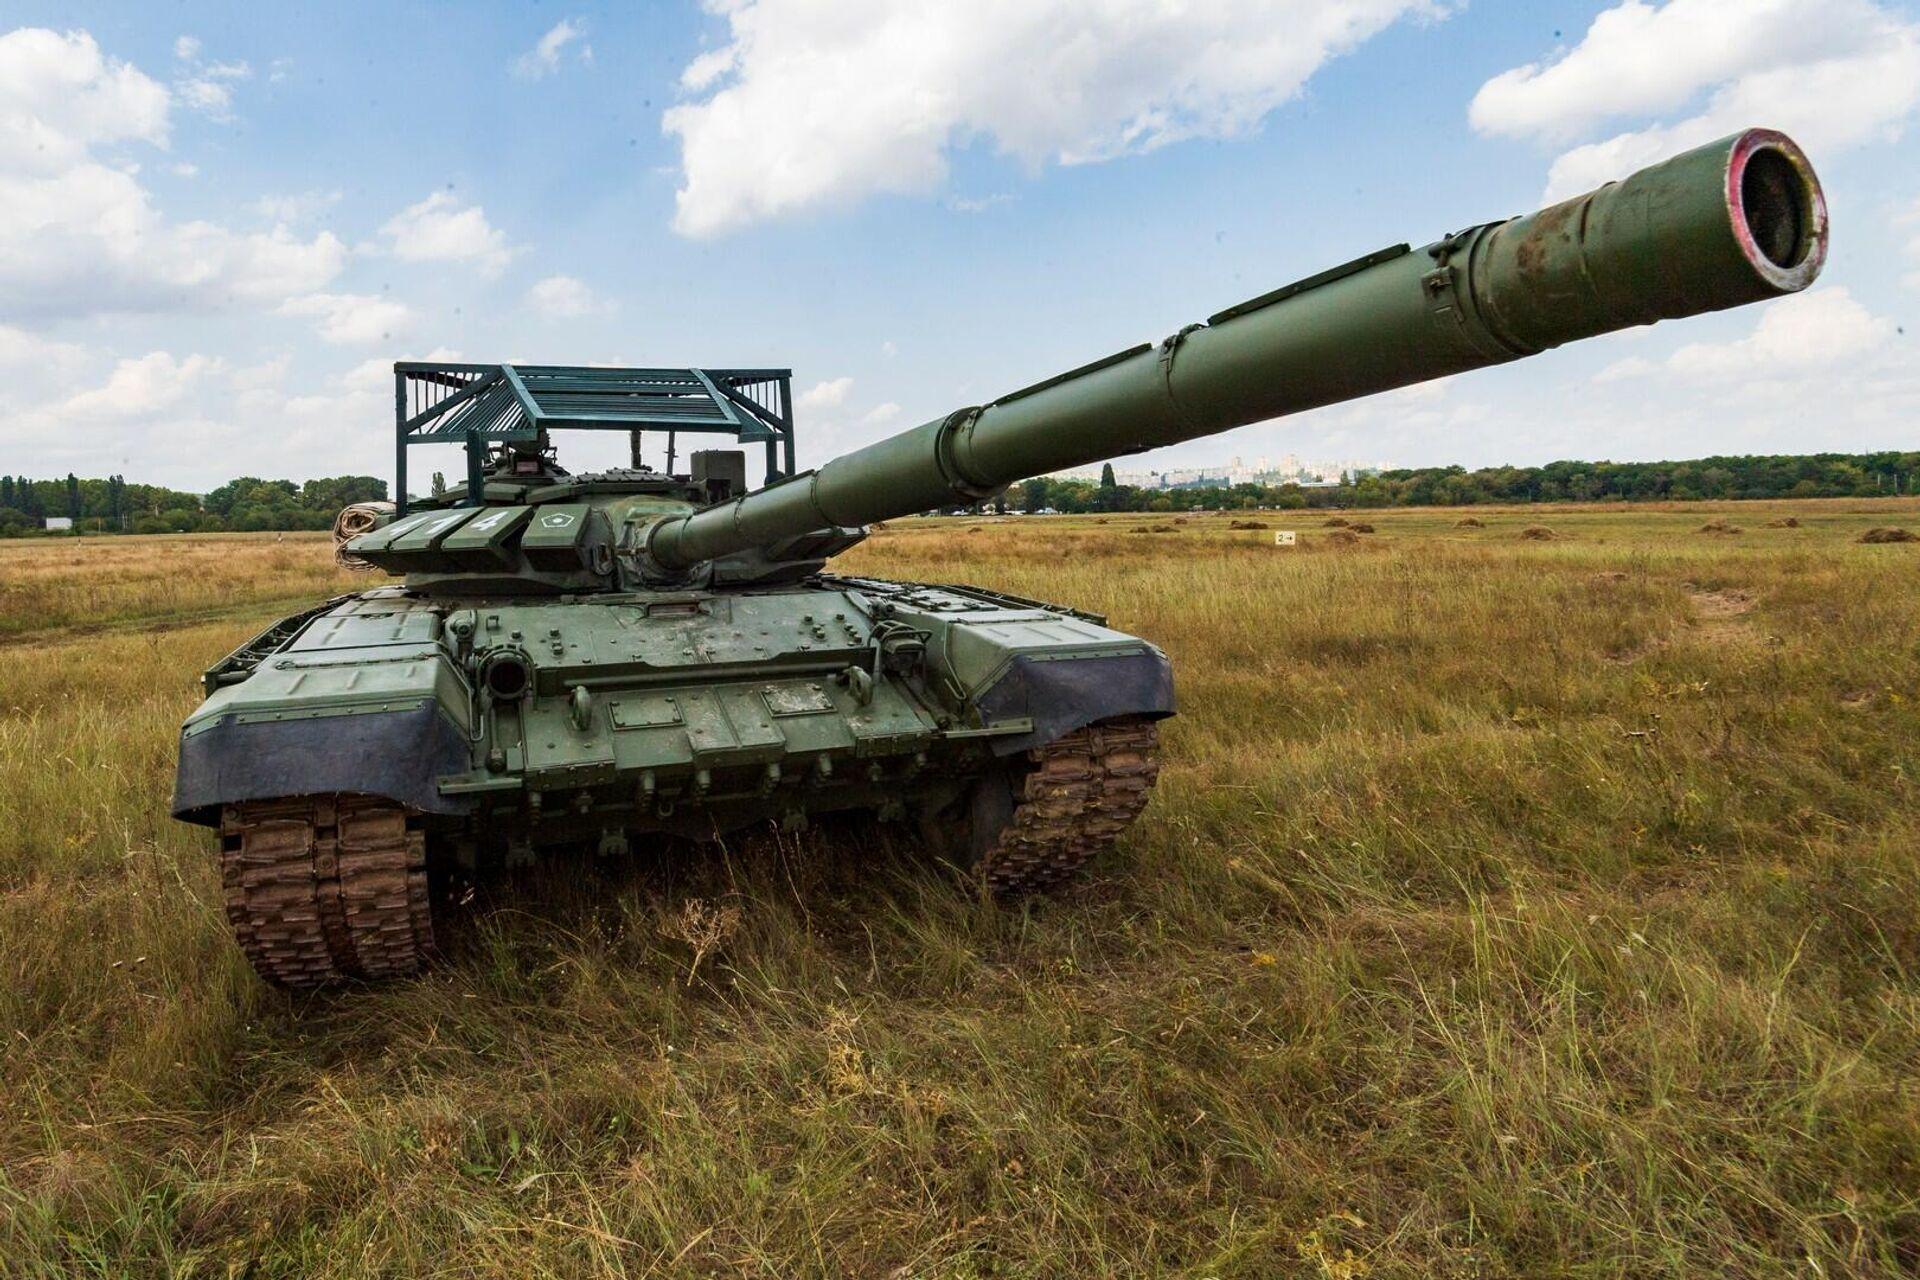 Танк Т-72Б3М - РИА Новости, 1920, 25.08.2021